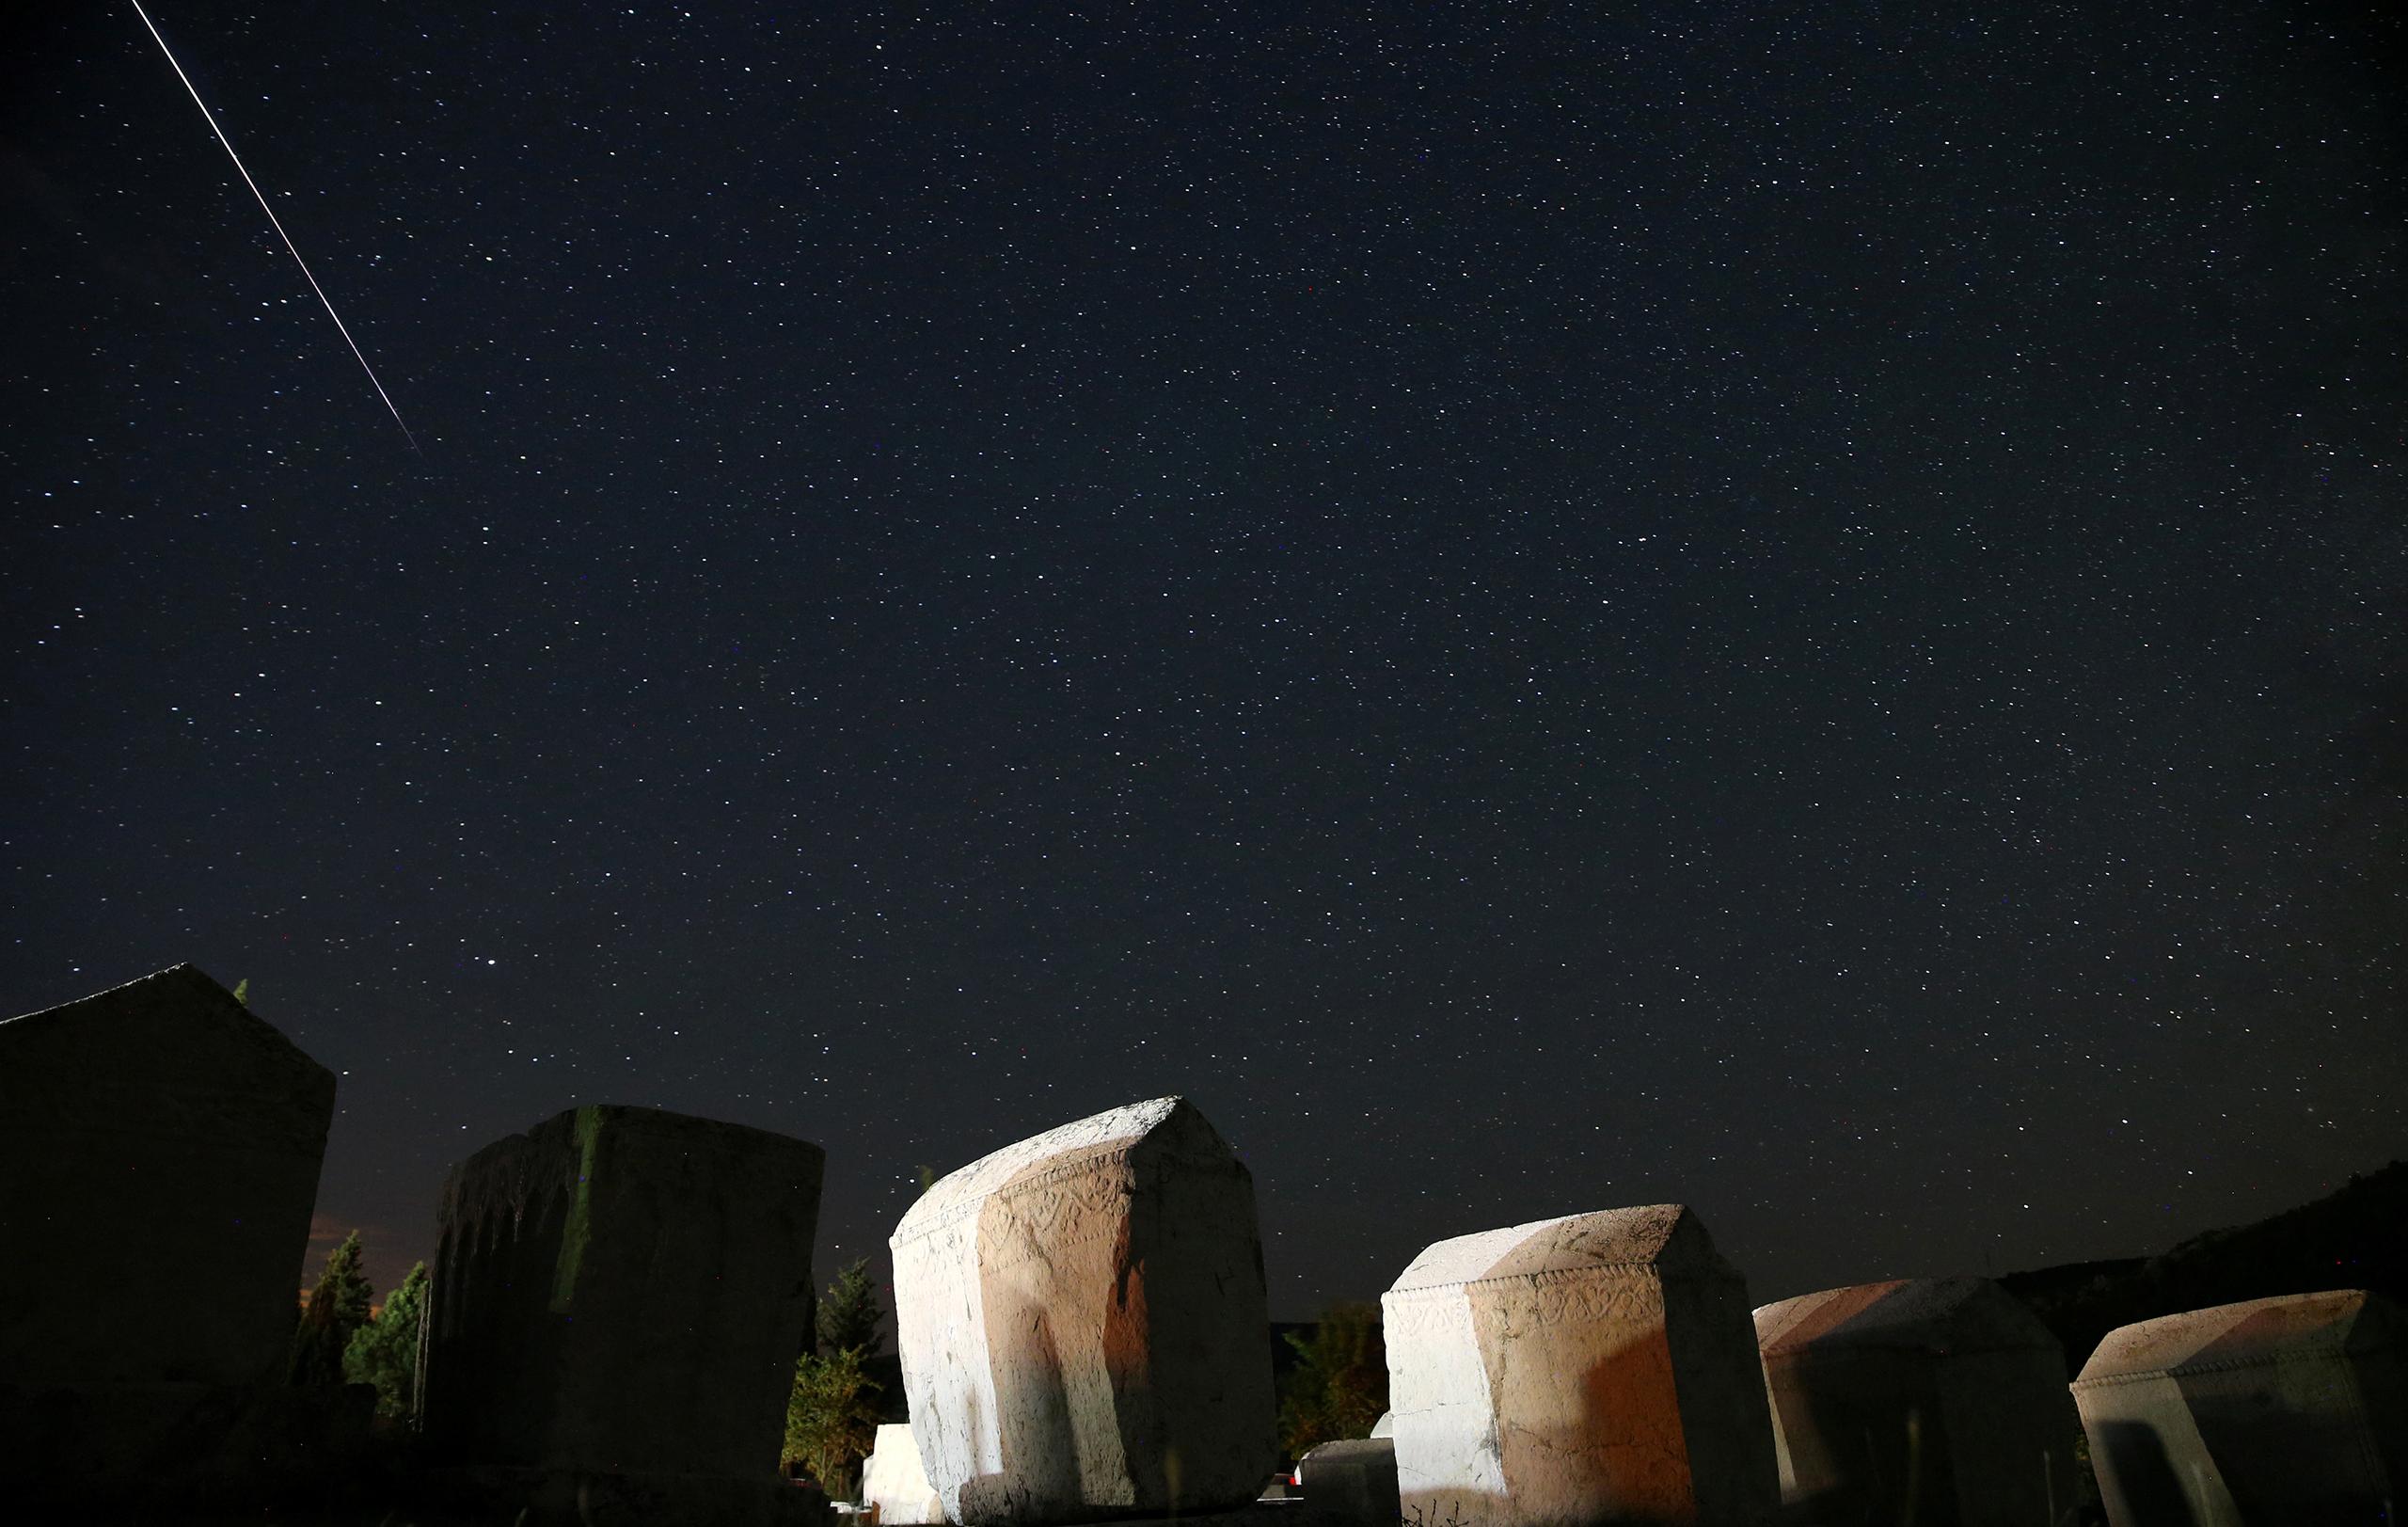 A meteor streaks past stars in the night sky above medieval tombstones in Radmilje near Stolac, south of Sarajevo, Bosnia and Herzegovina, Aug. 12, 2016.